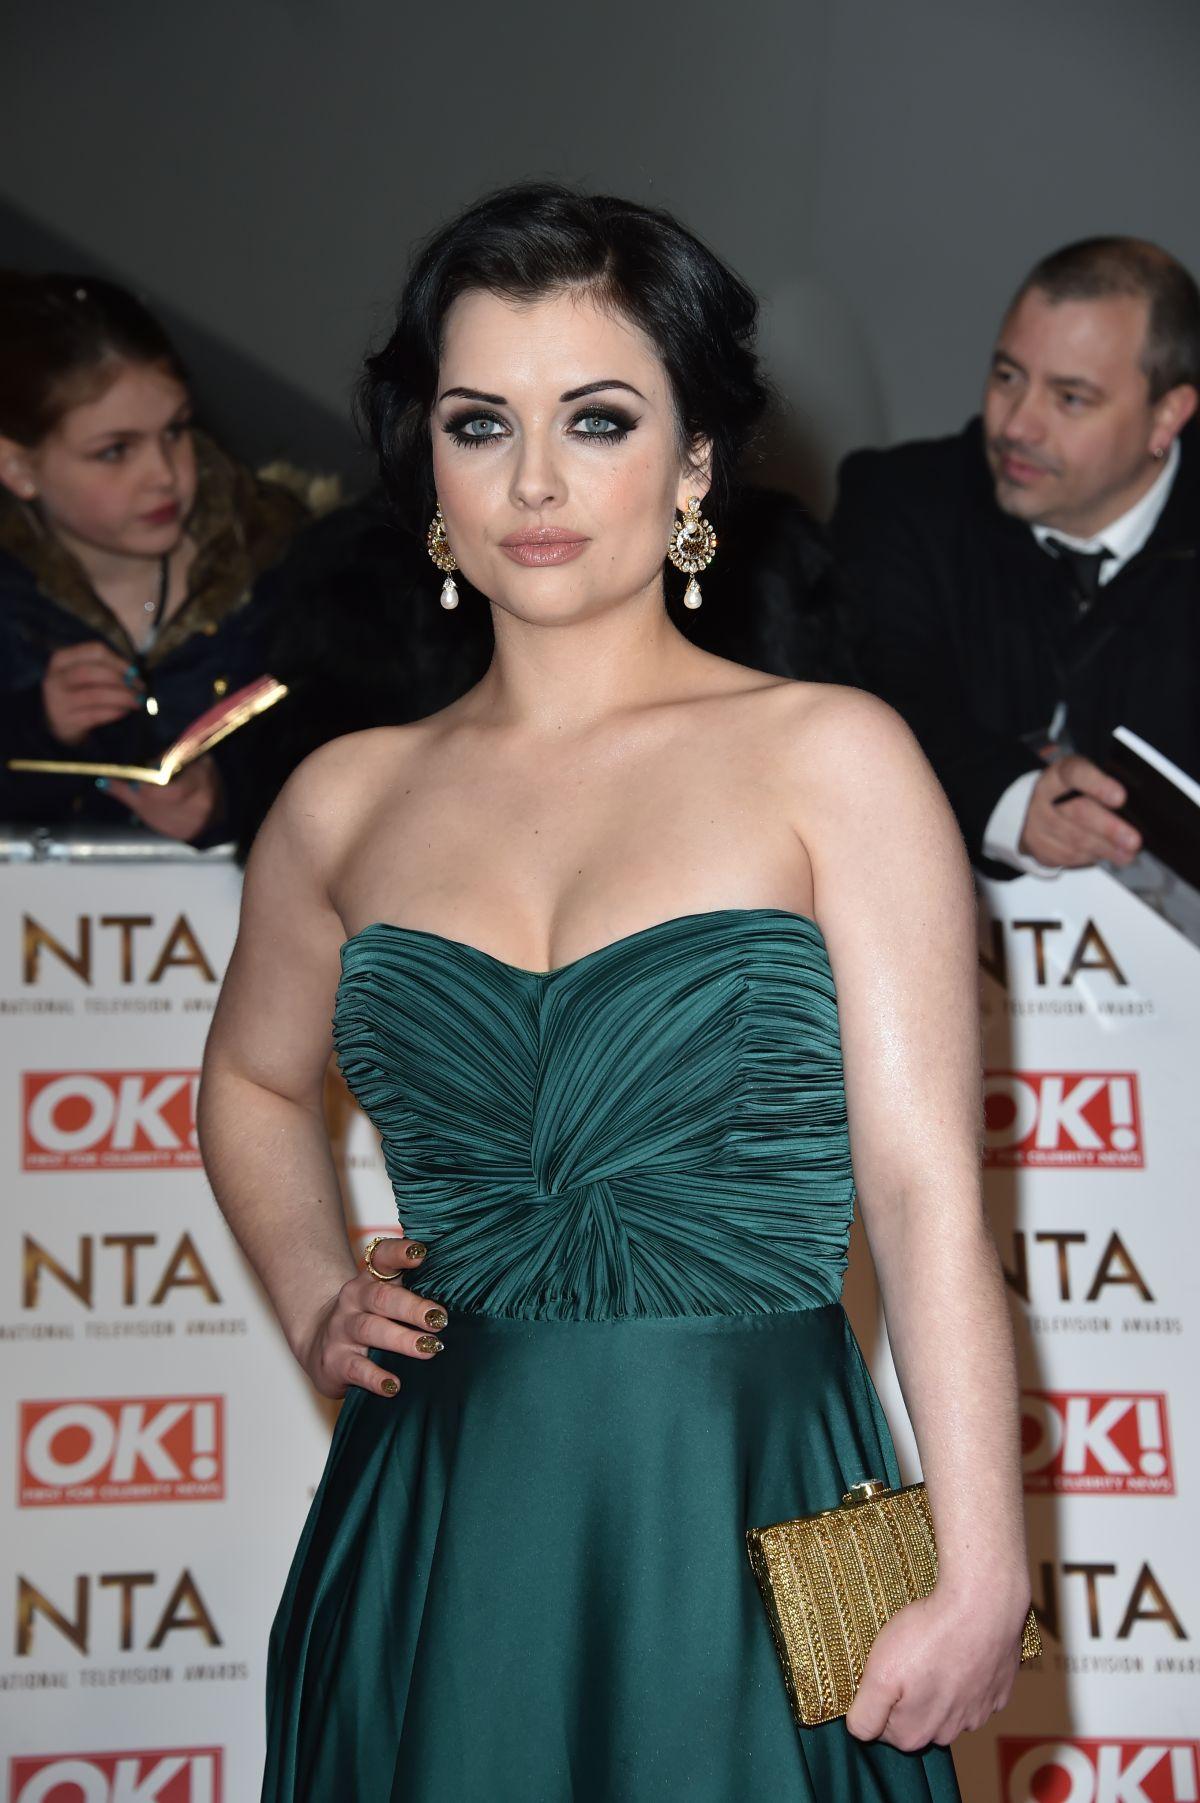 SHONA MCGARTY at 2015 National Television Awards in London